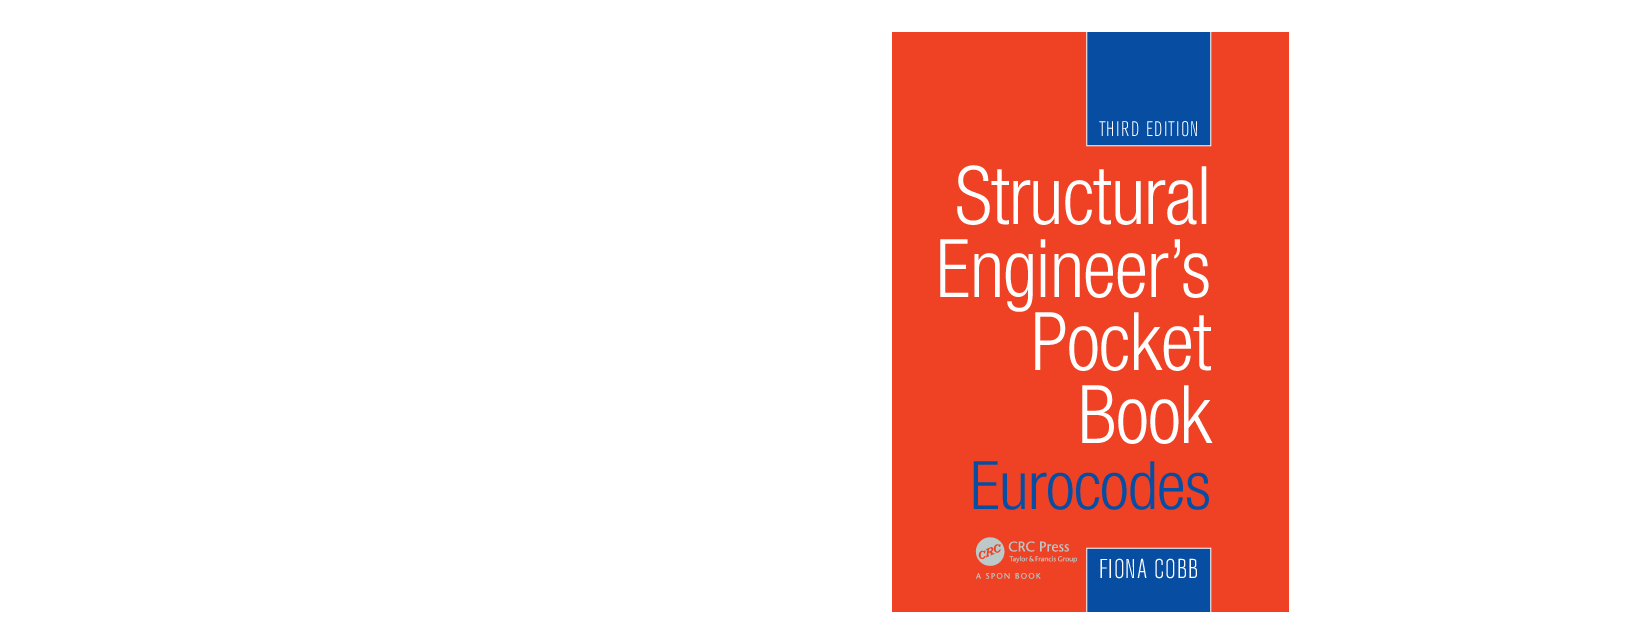 Engineers Pocket Book Pdf